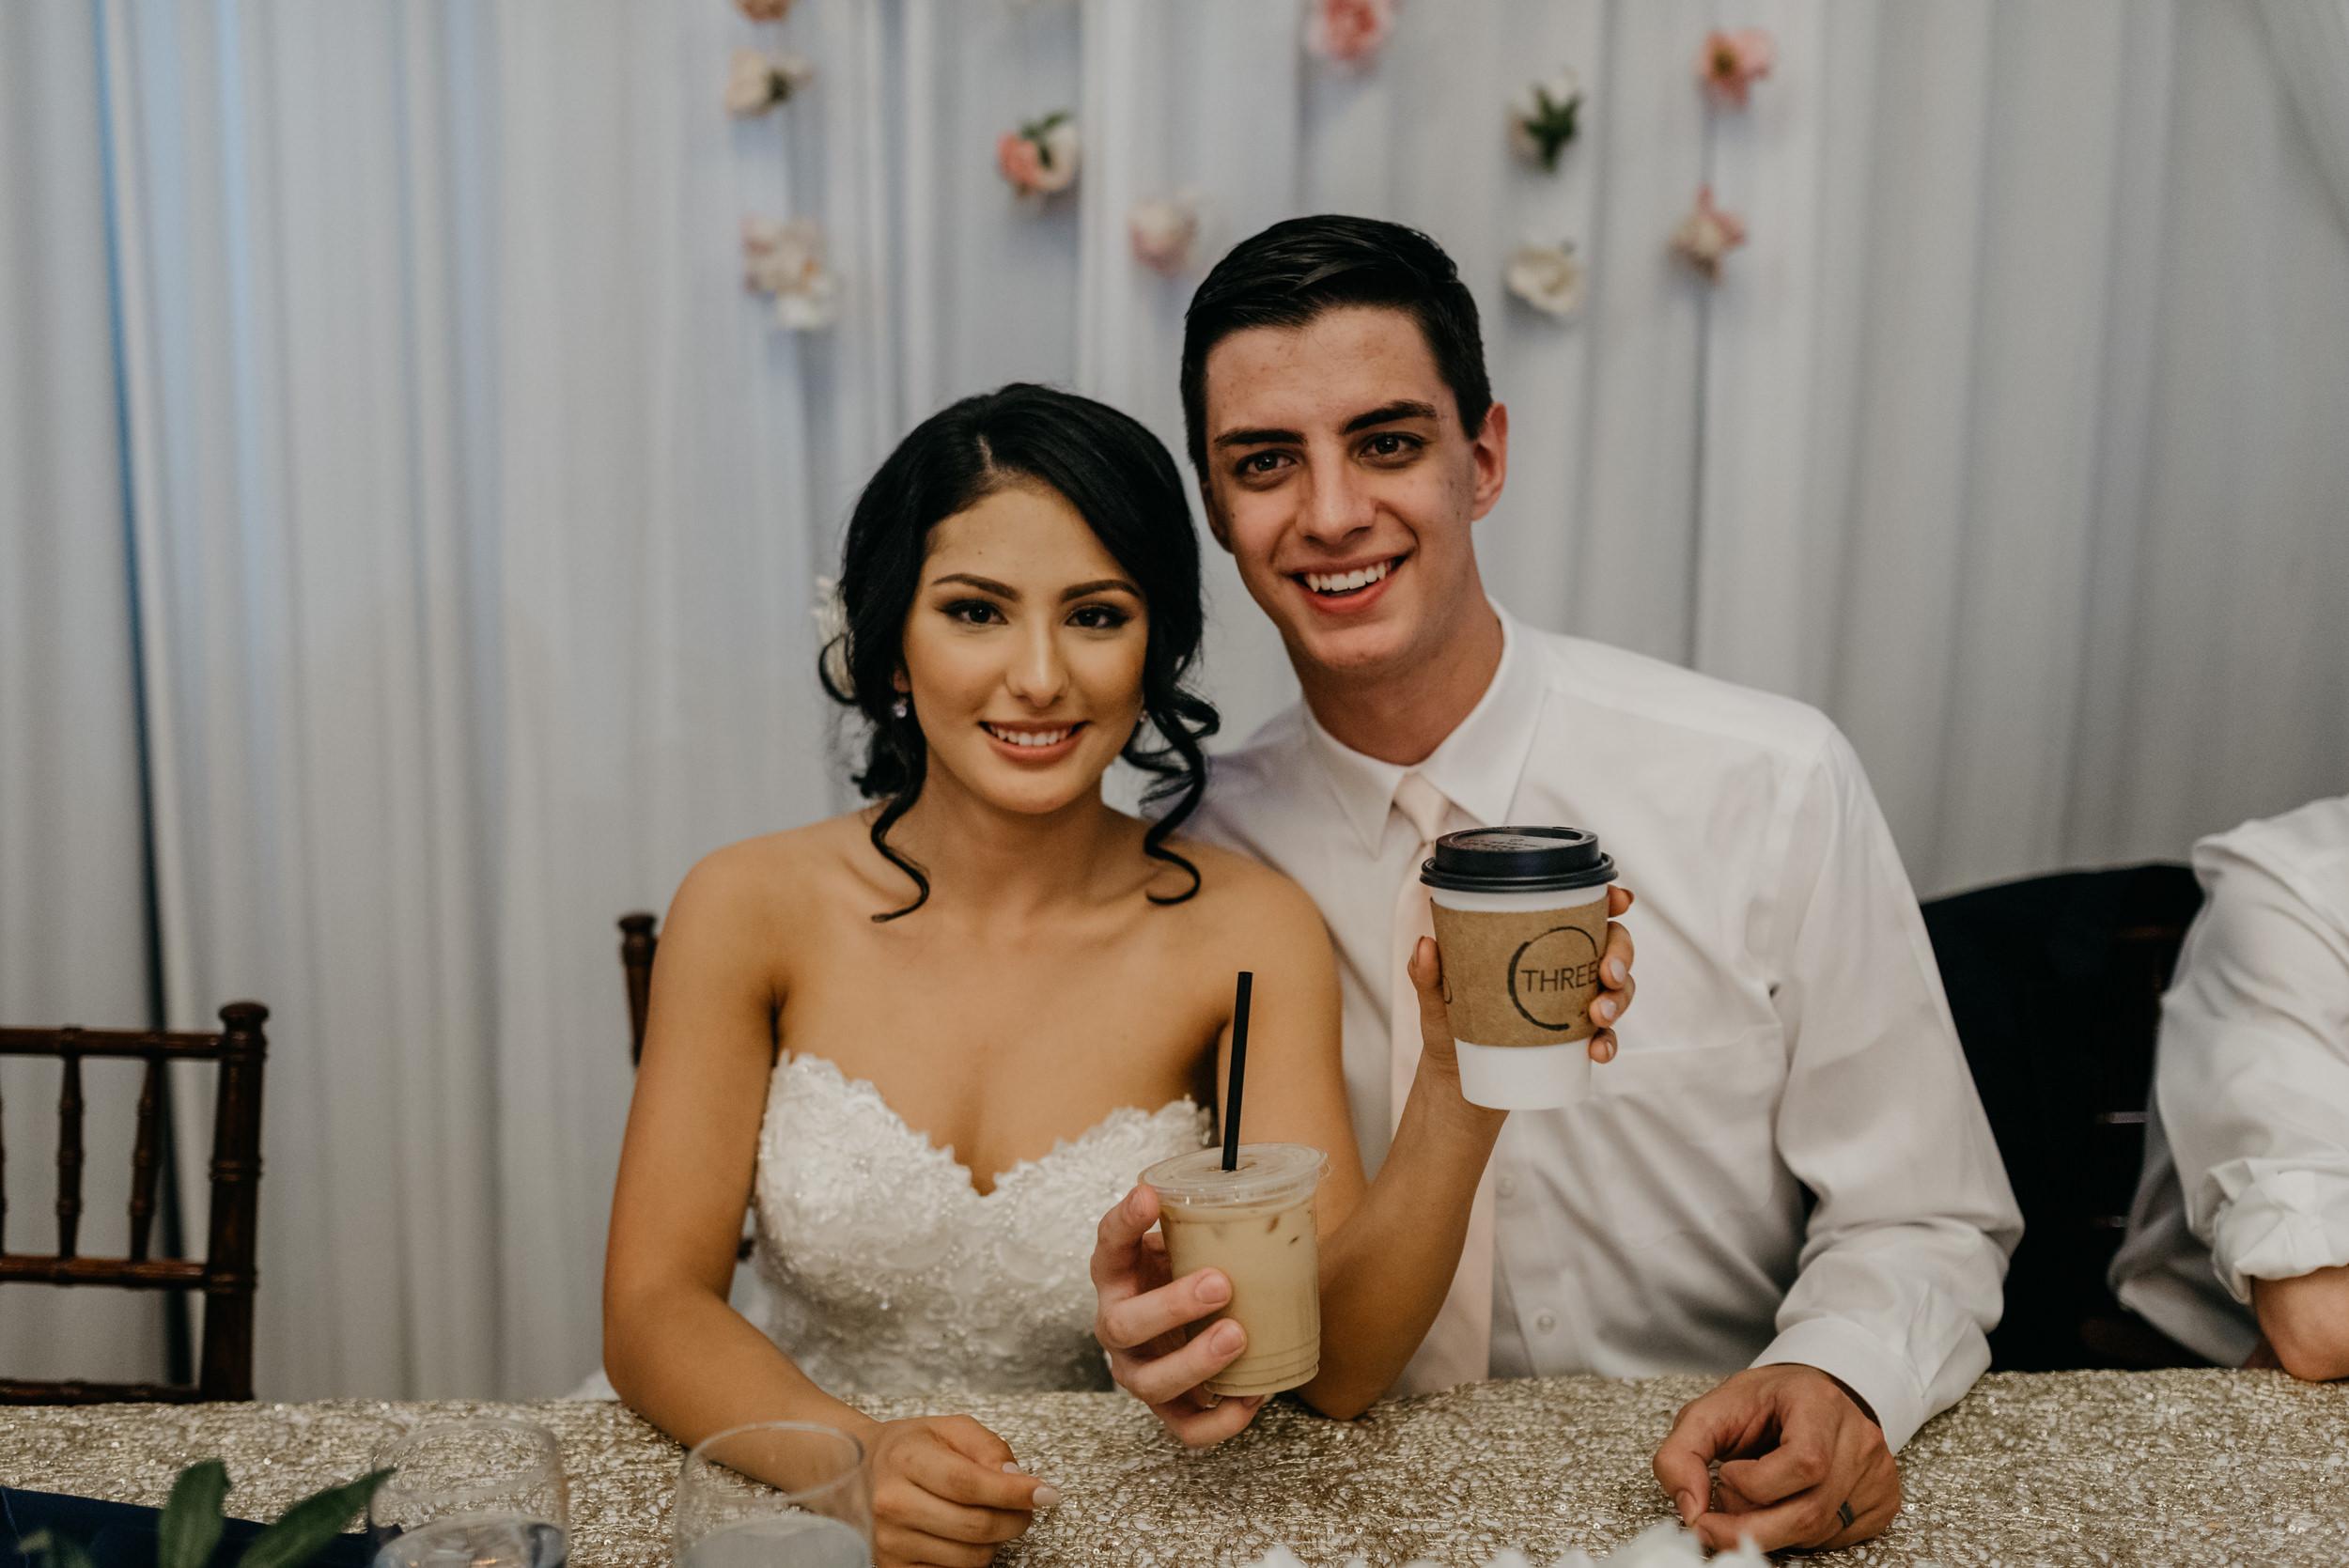 106-reception-west-end-ballroom-portland-wedding-photographer-8346.jpg